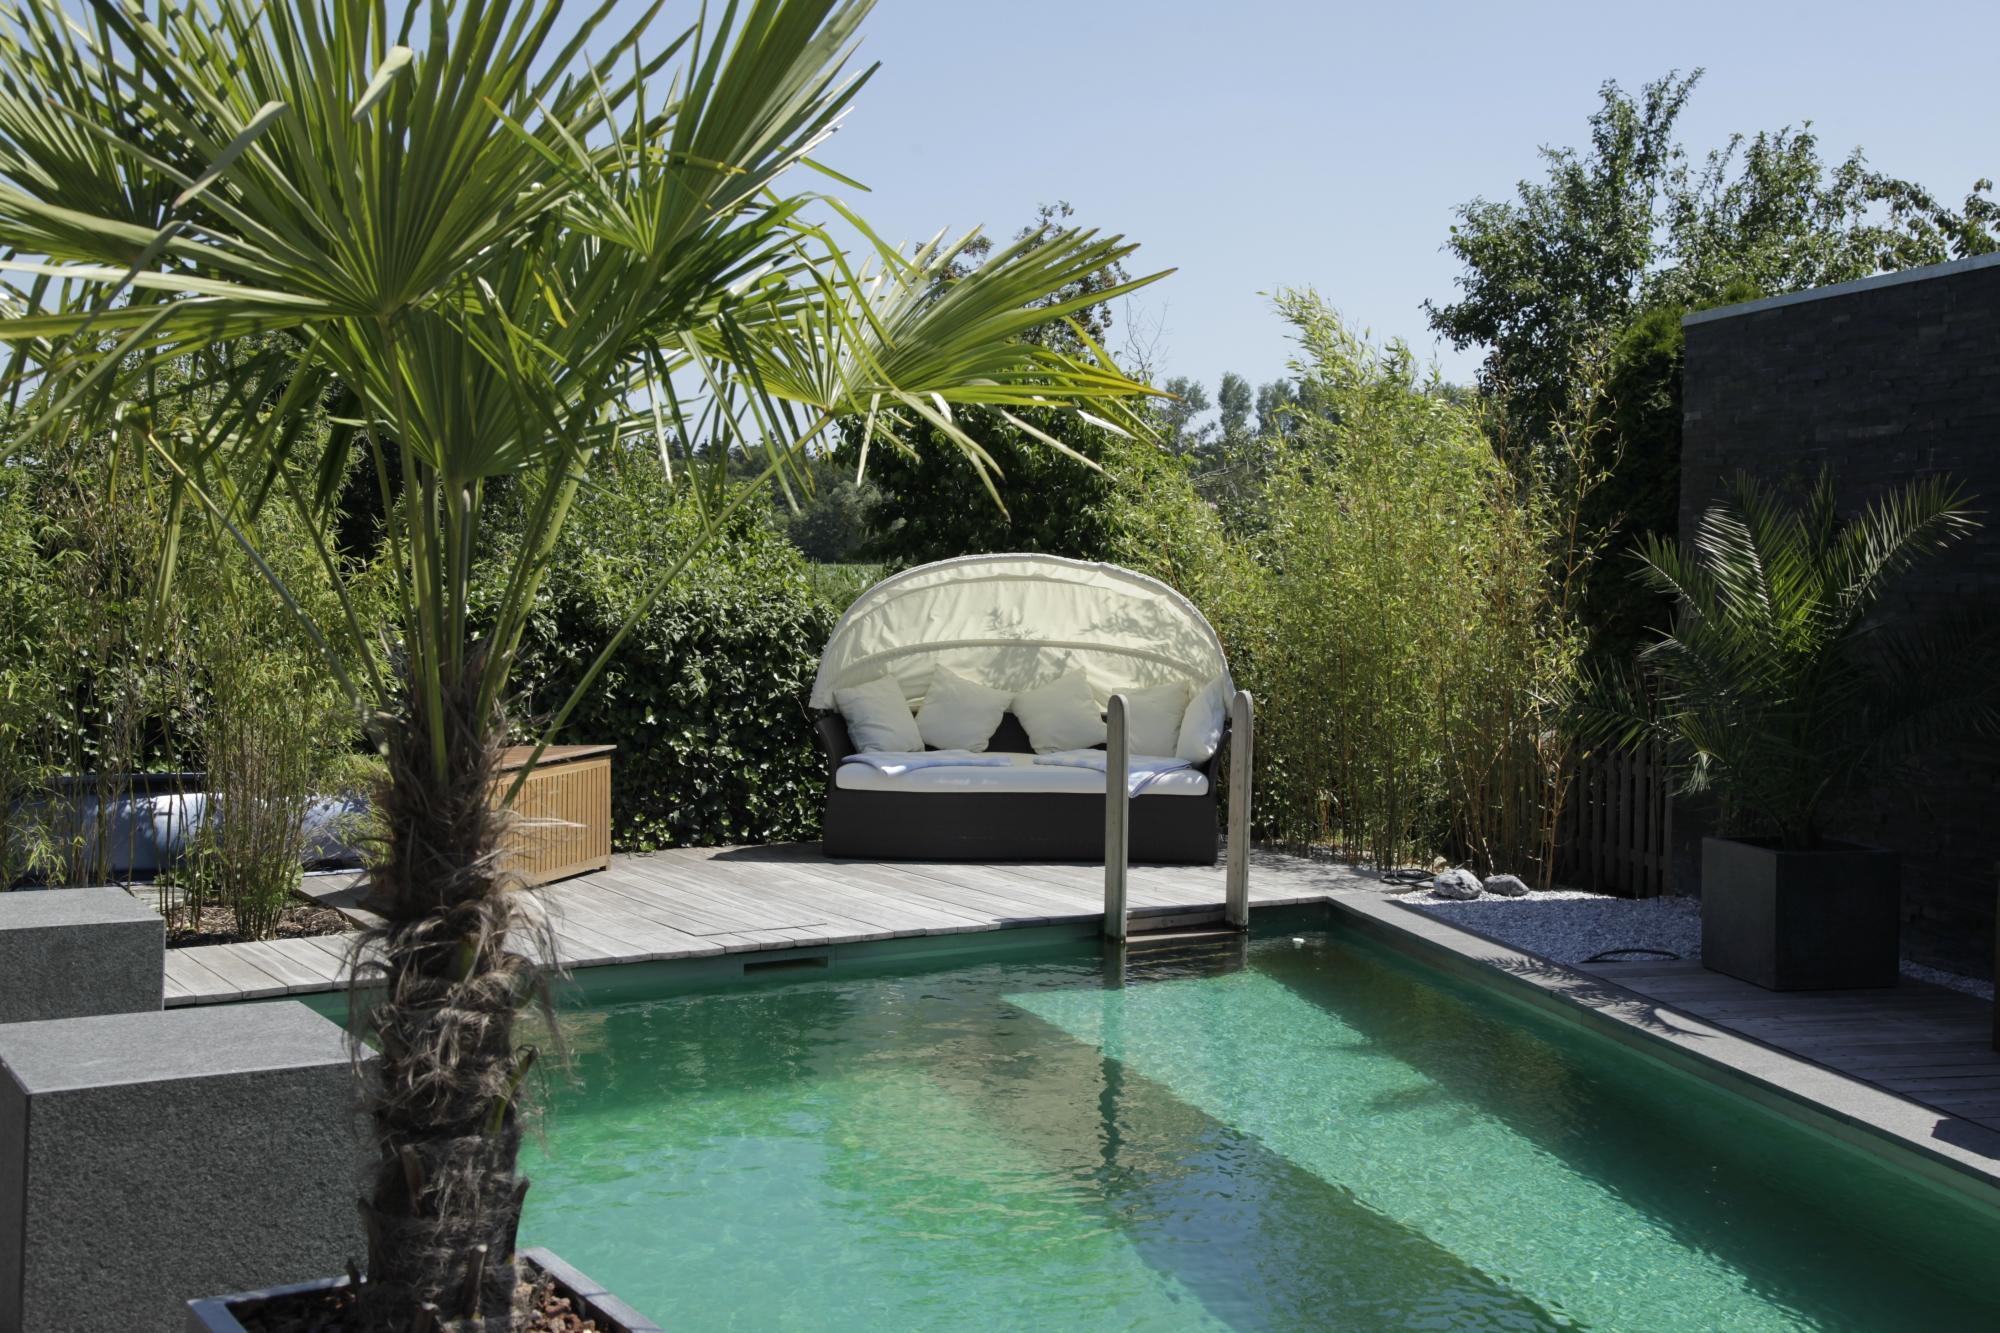 pool ideas pinterest. Black Bedroom Furniture Sets. Home Design Ideas